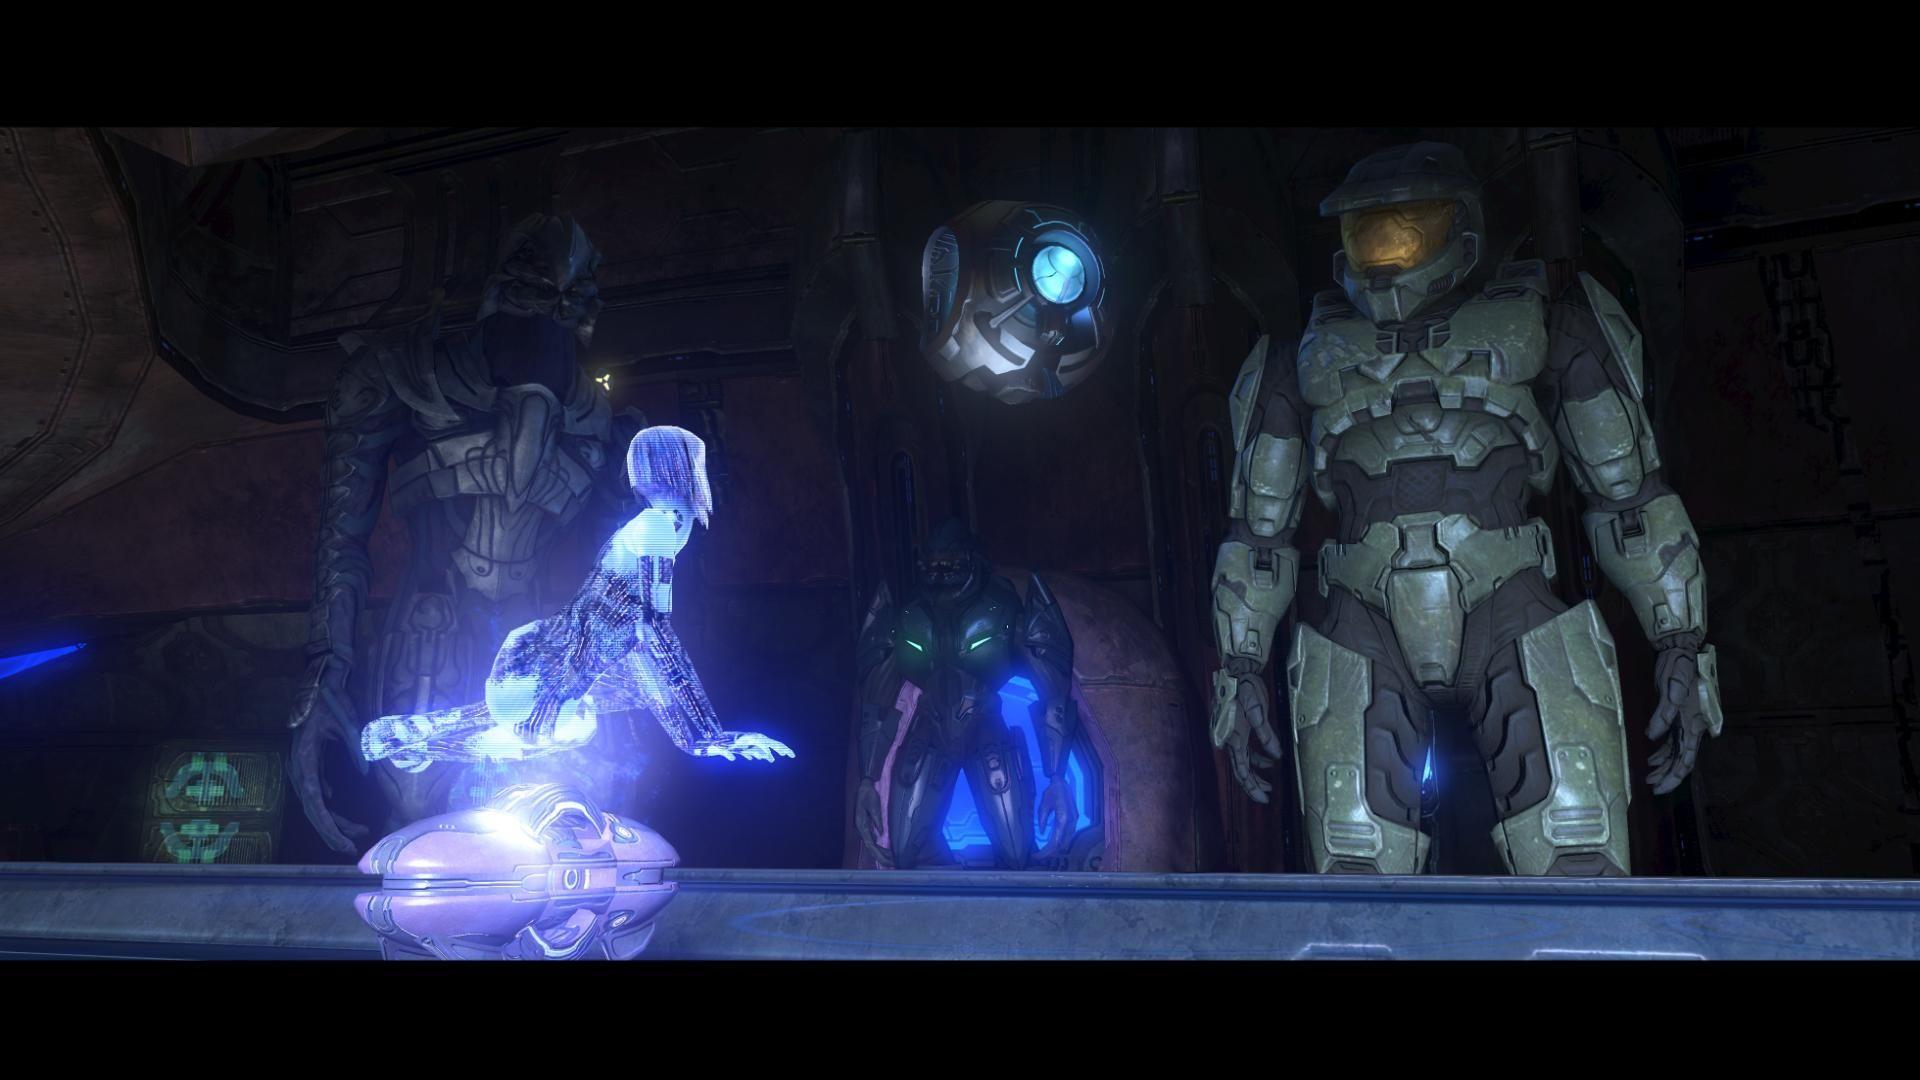 Video Game   Halo 3 Cortana Master Chief Wallpaper Halo 3 1920x1080